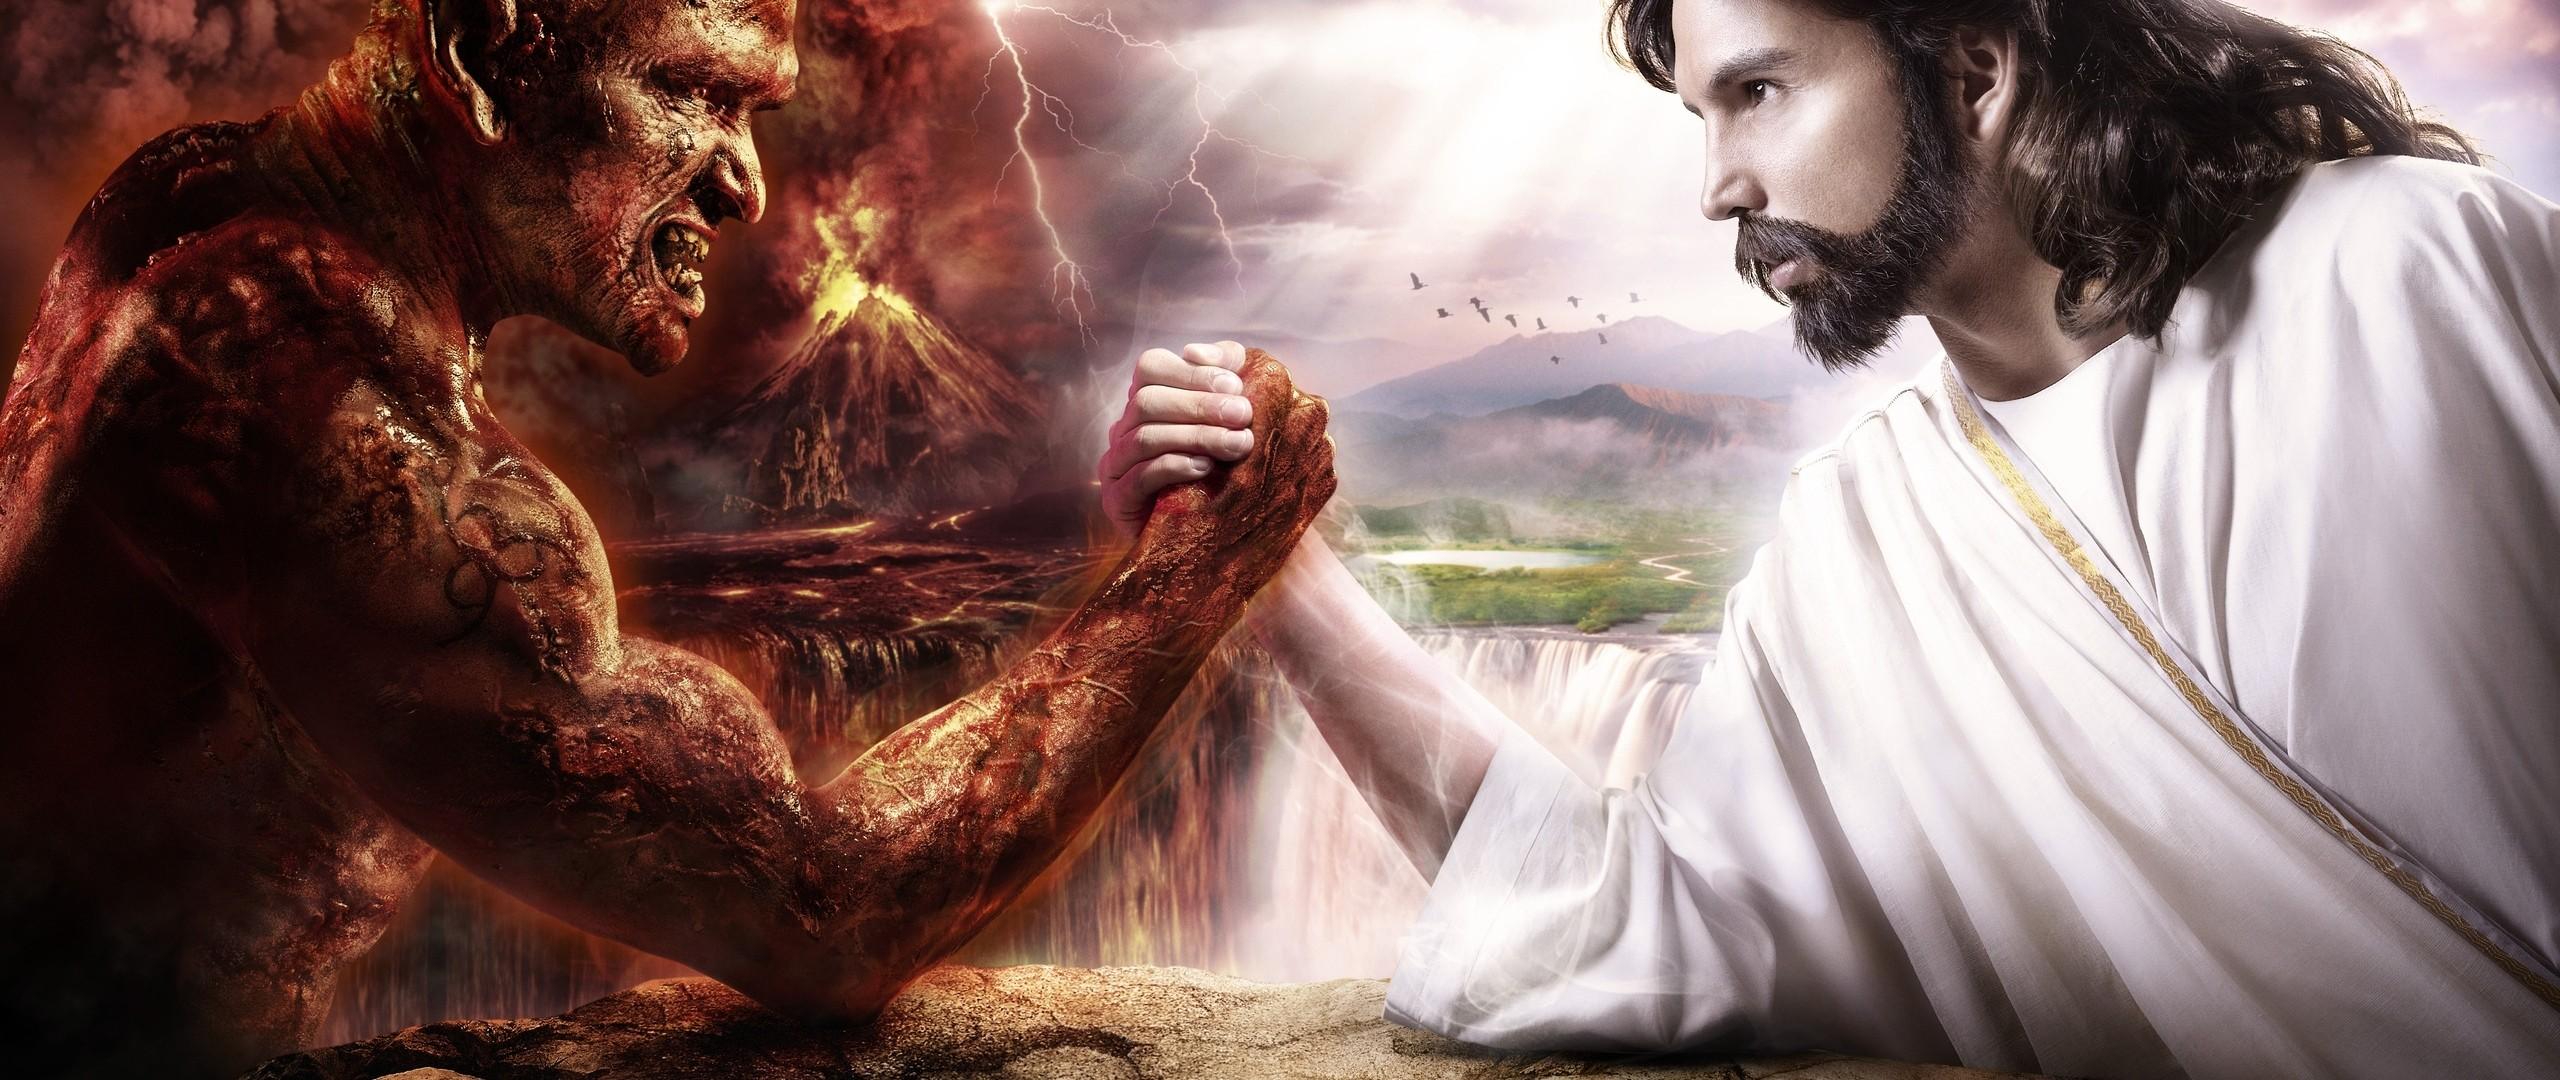 Preview wallpaper god, devil, struggle, good, harm 2560×1080